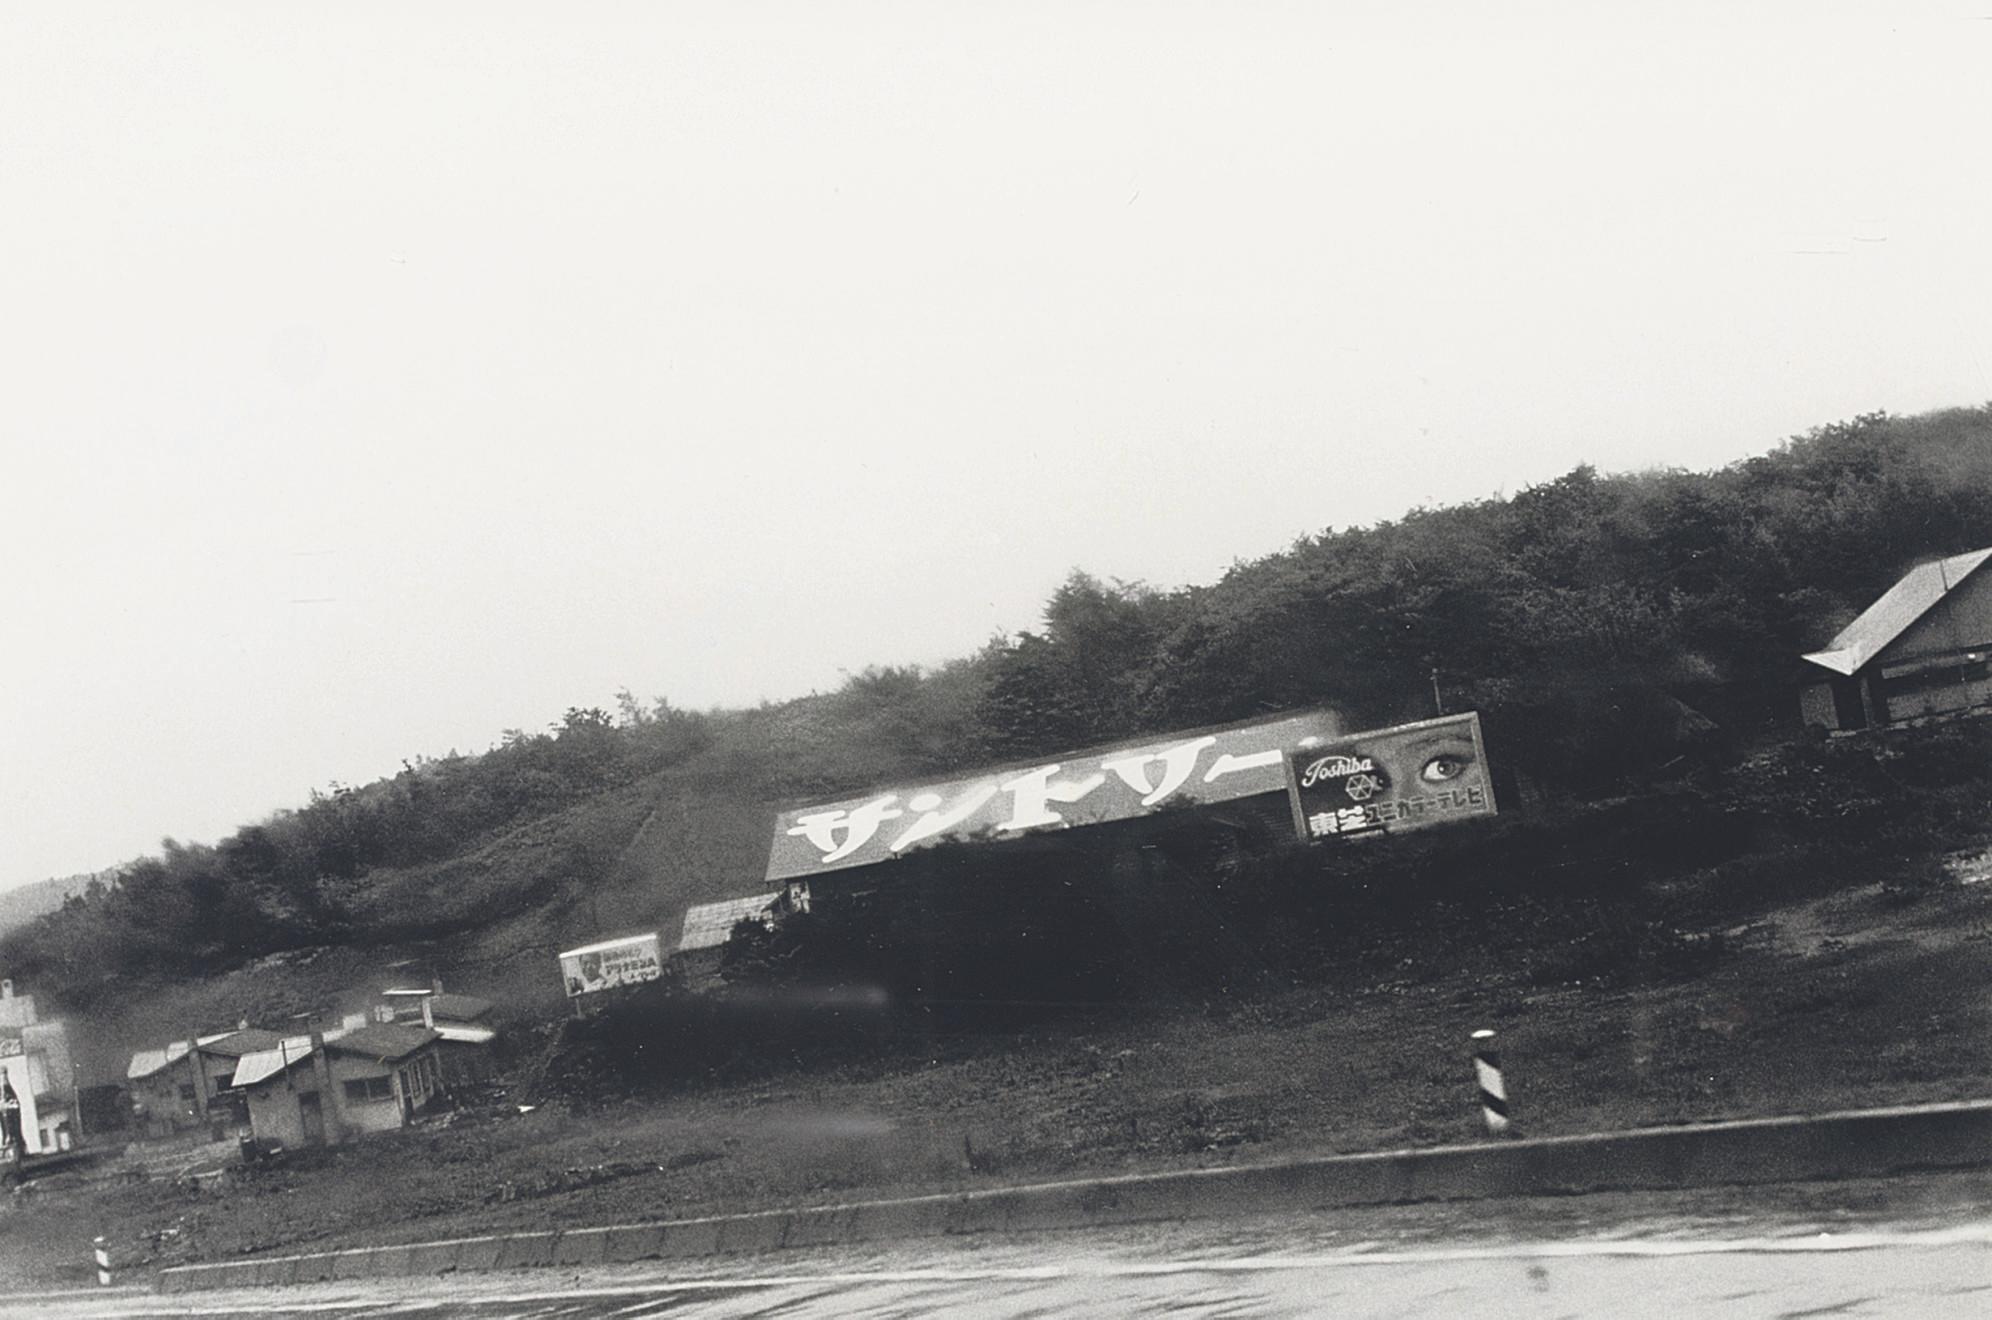 TAKANASHI YUTAKA (b.1935)